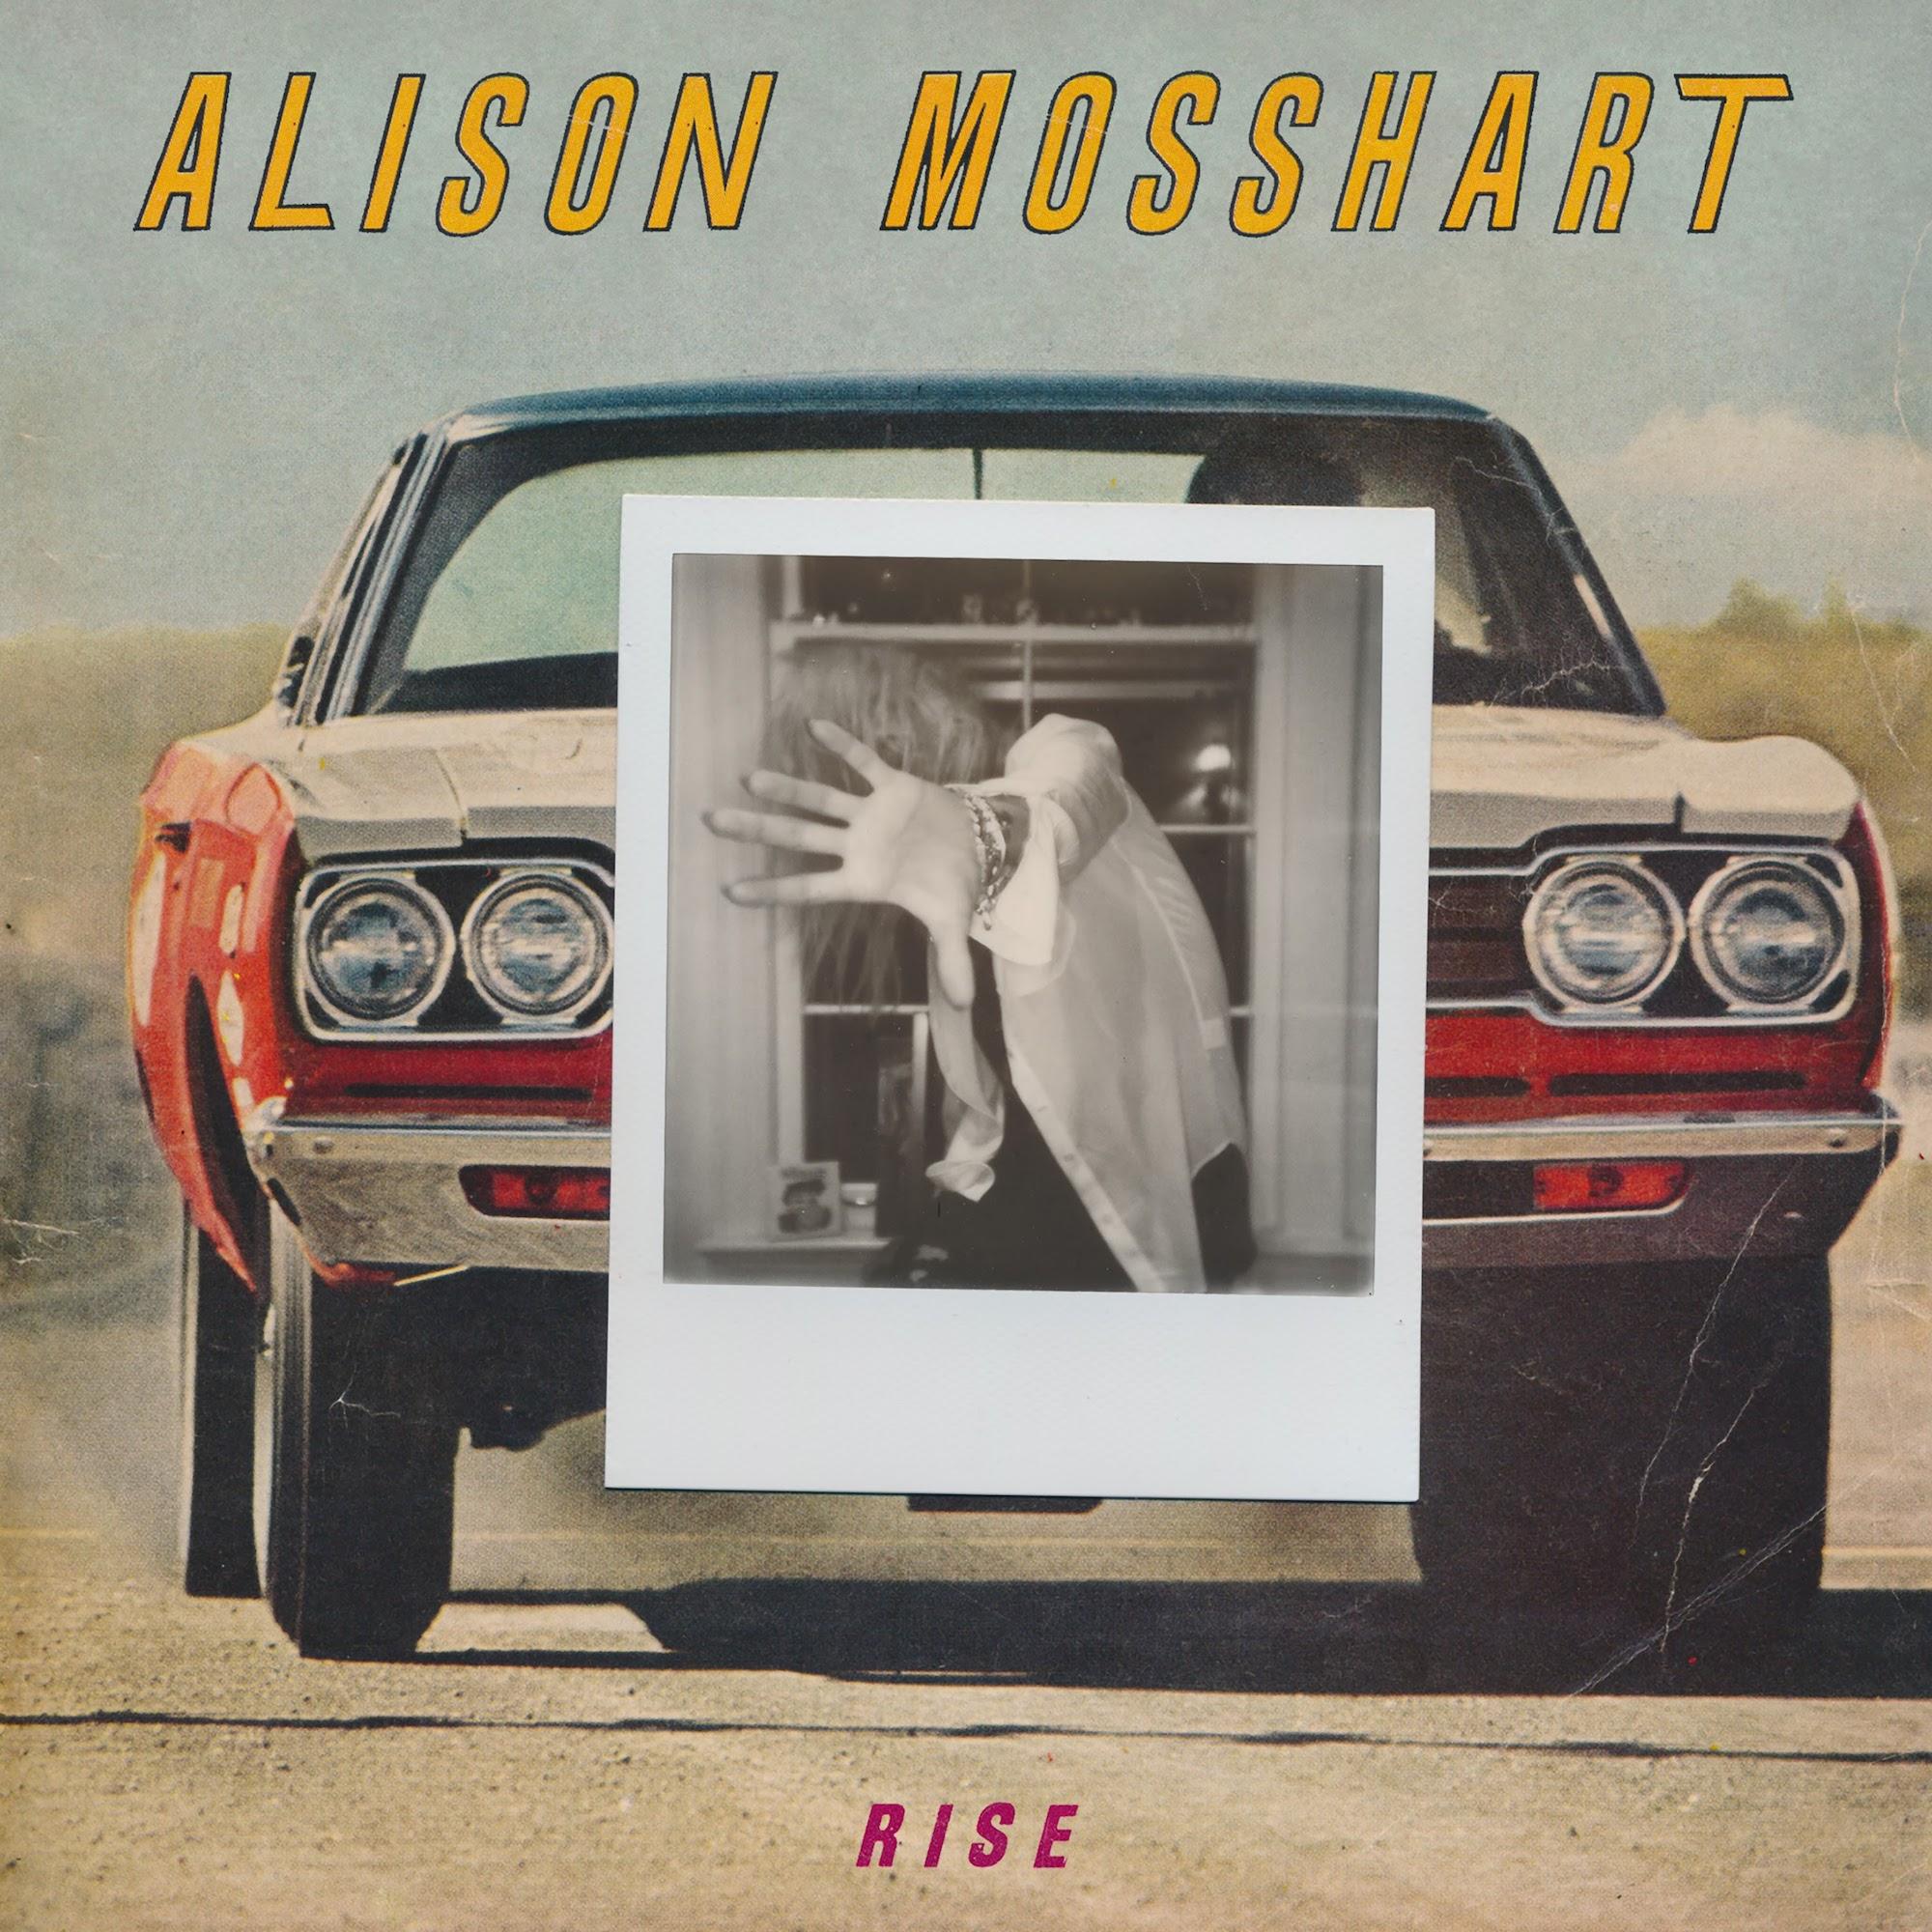 Mosshart RISE packshot 3000 Alison Mosshart Shares Debut Solo Single Rise: Stream